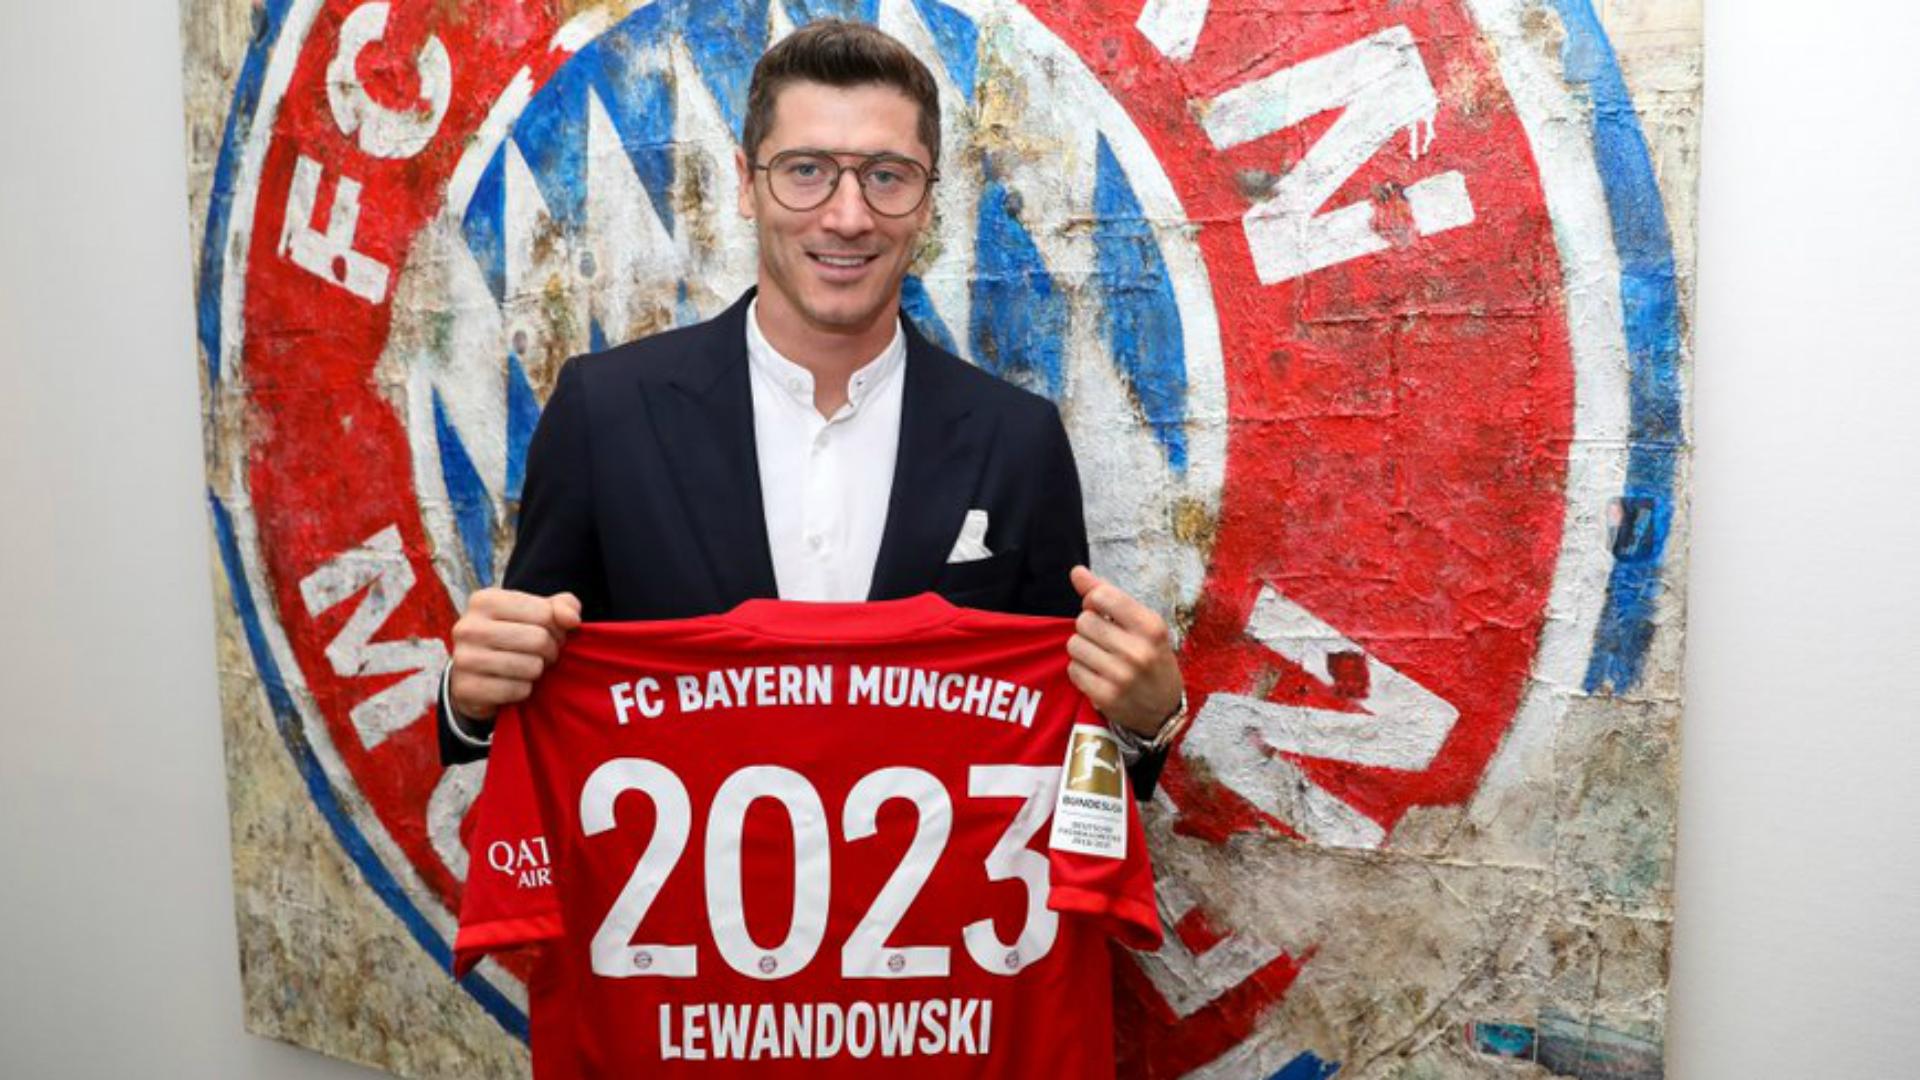 OFFICIEL - Bayern Munich : Lewandowski prolonge son contrat jusqu'en 2023 !